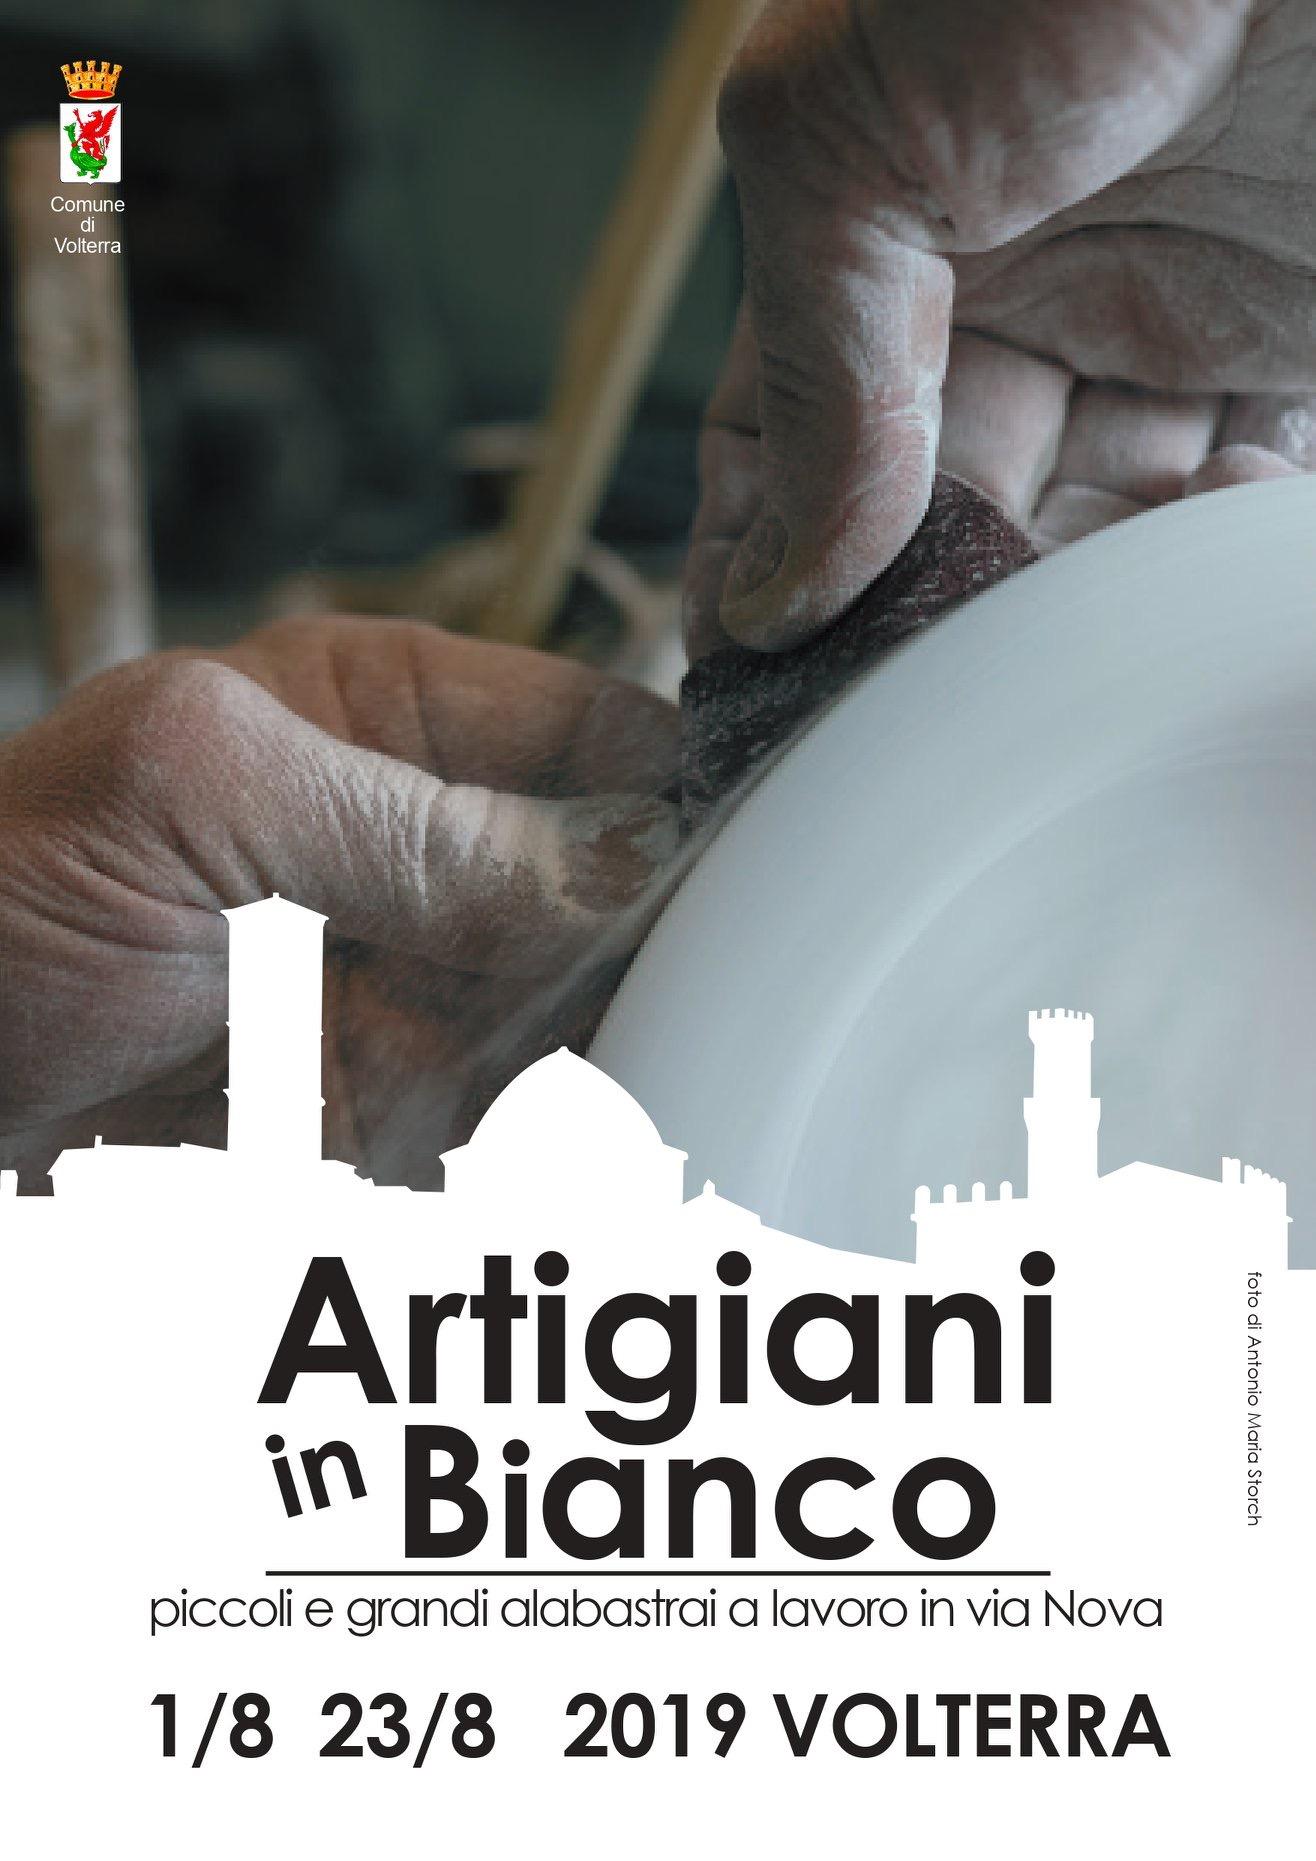 Artigiani in bianco | Volterra